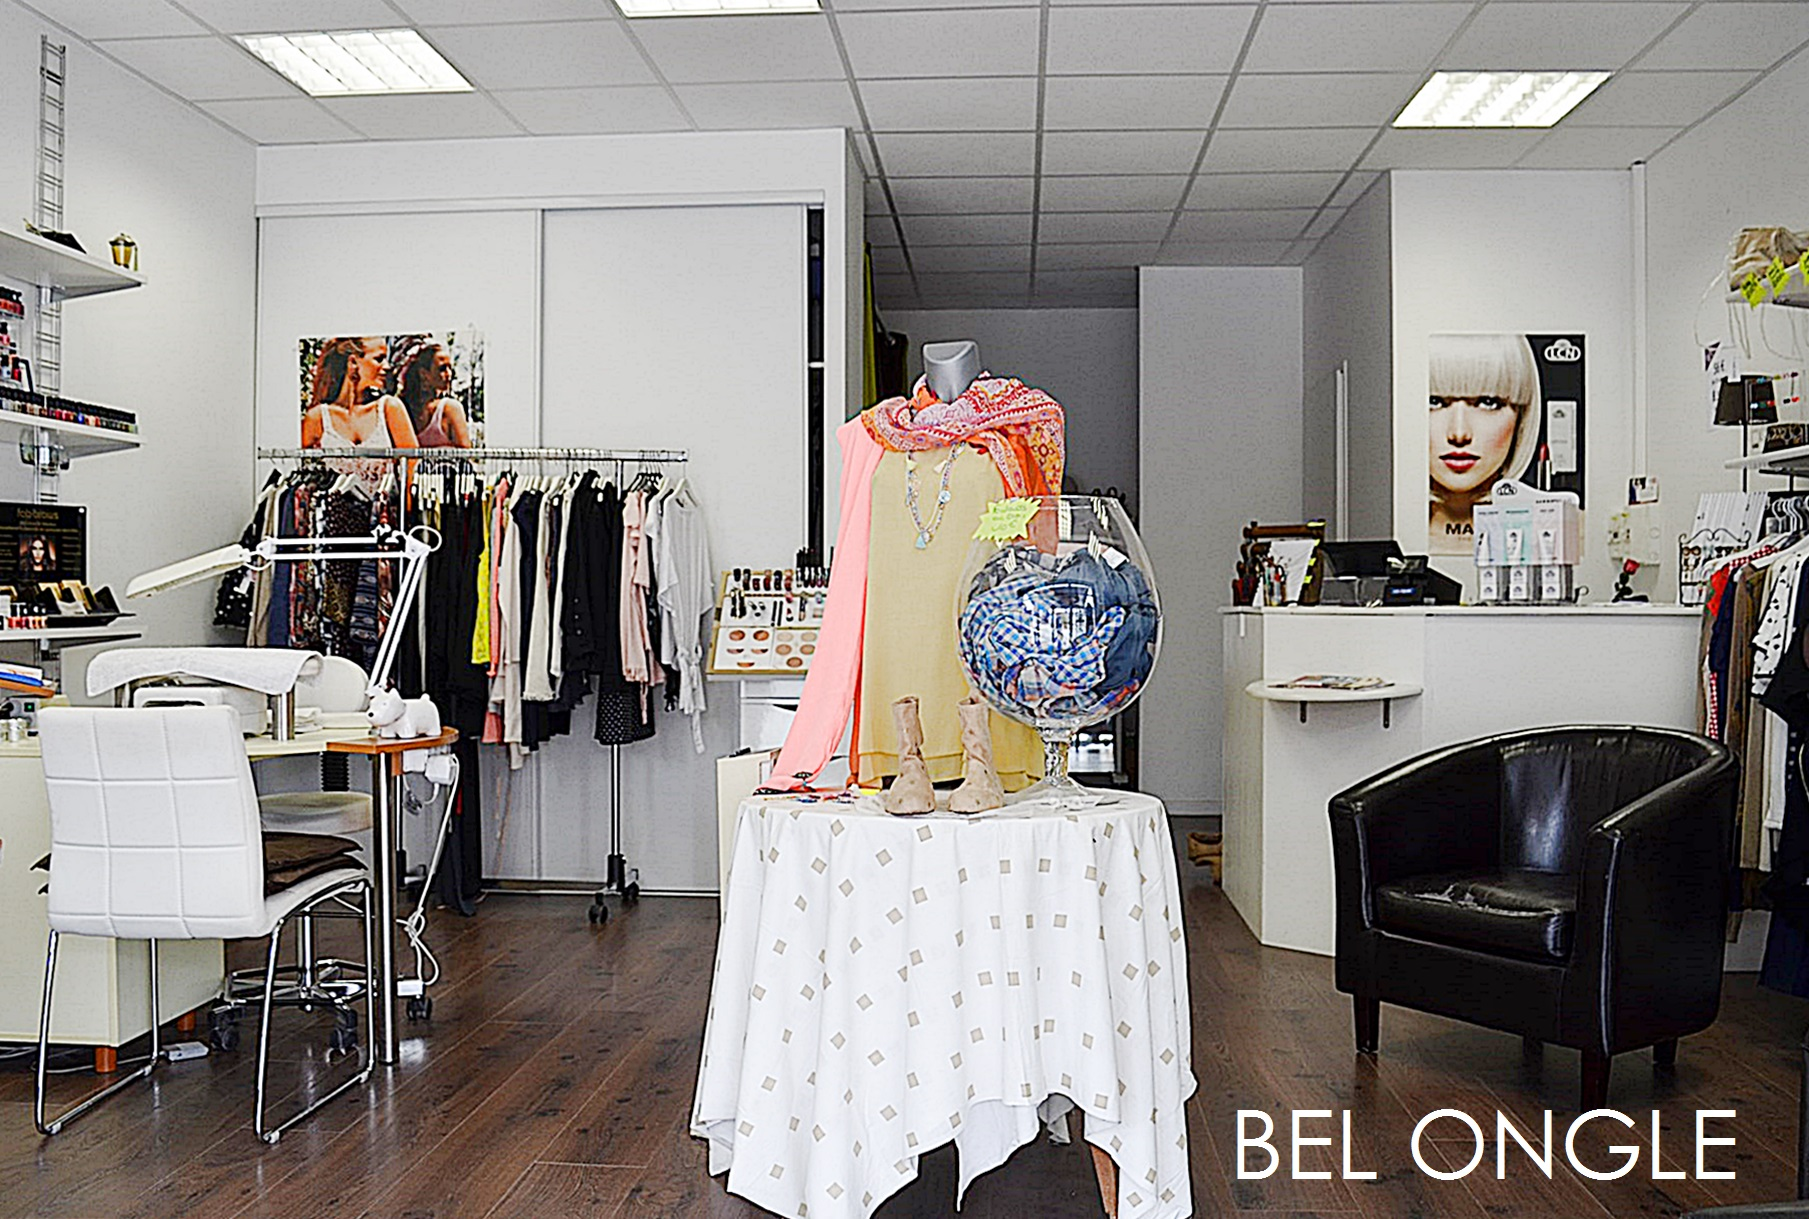 Bel Ongle Pessac centre